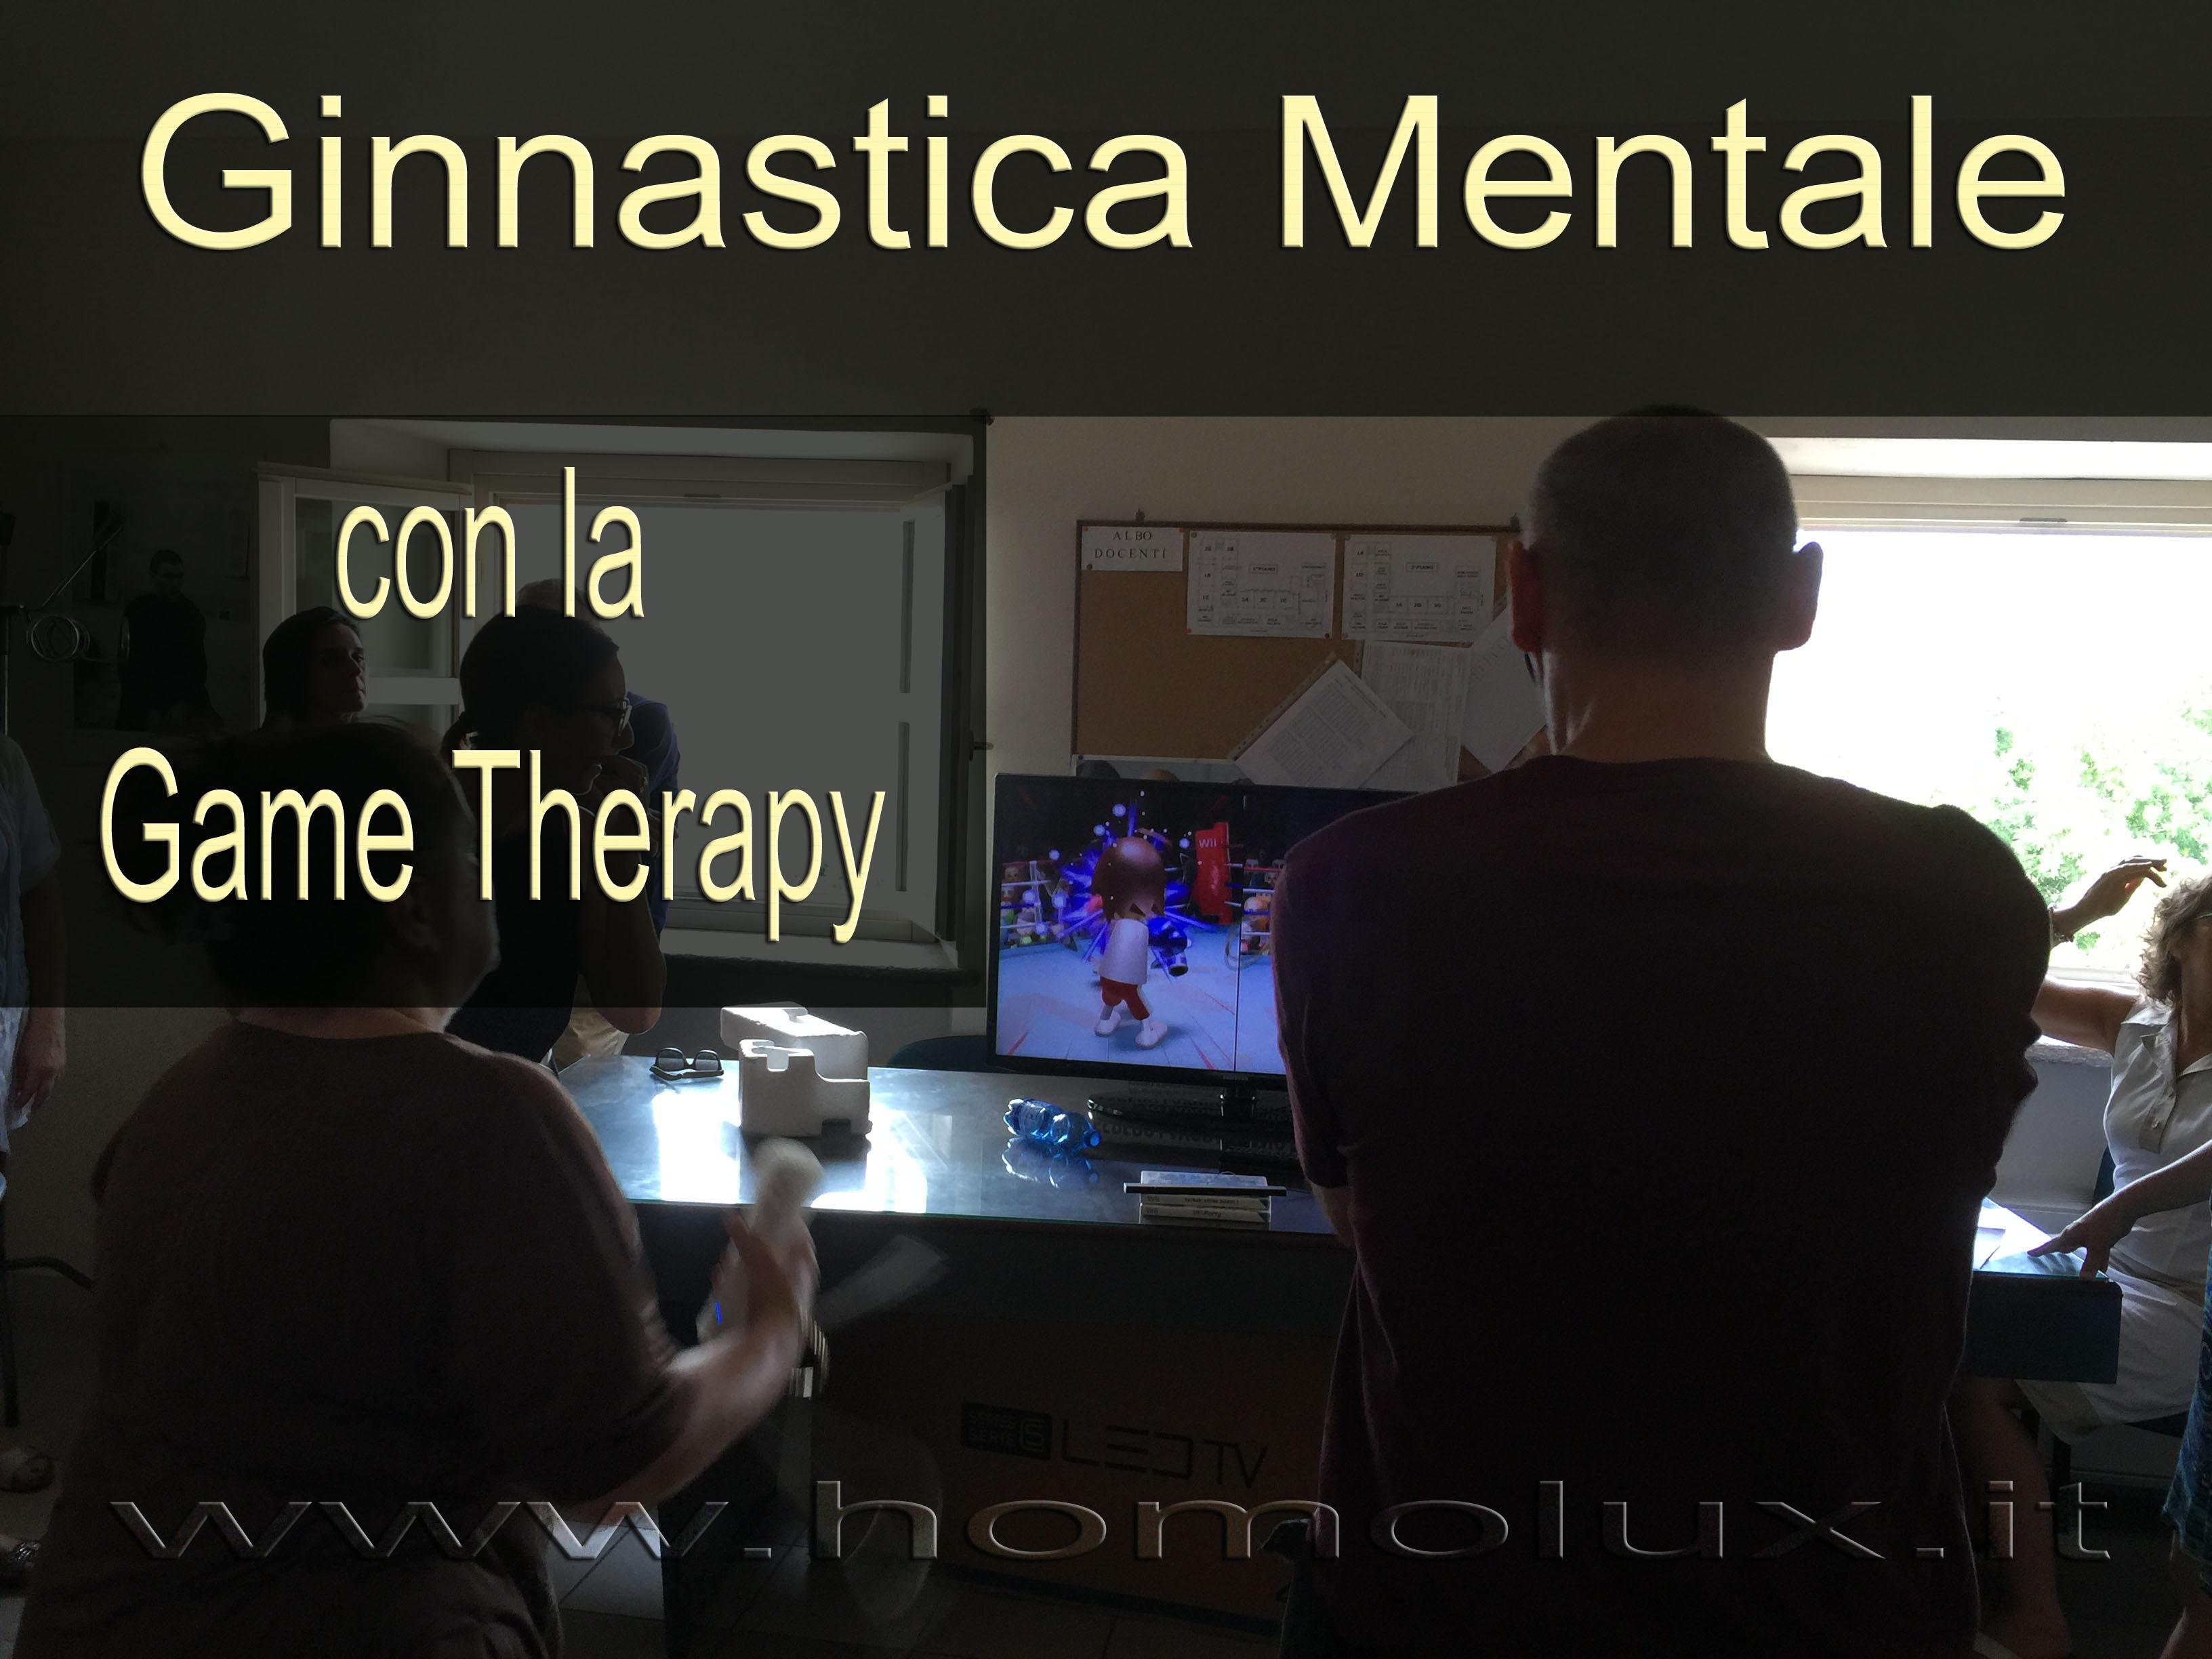 ginnastica mentale